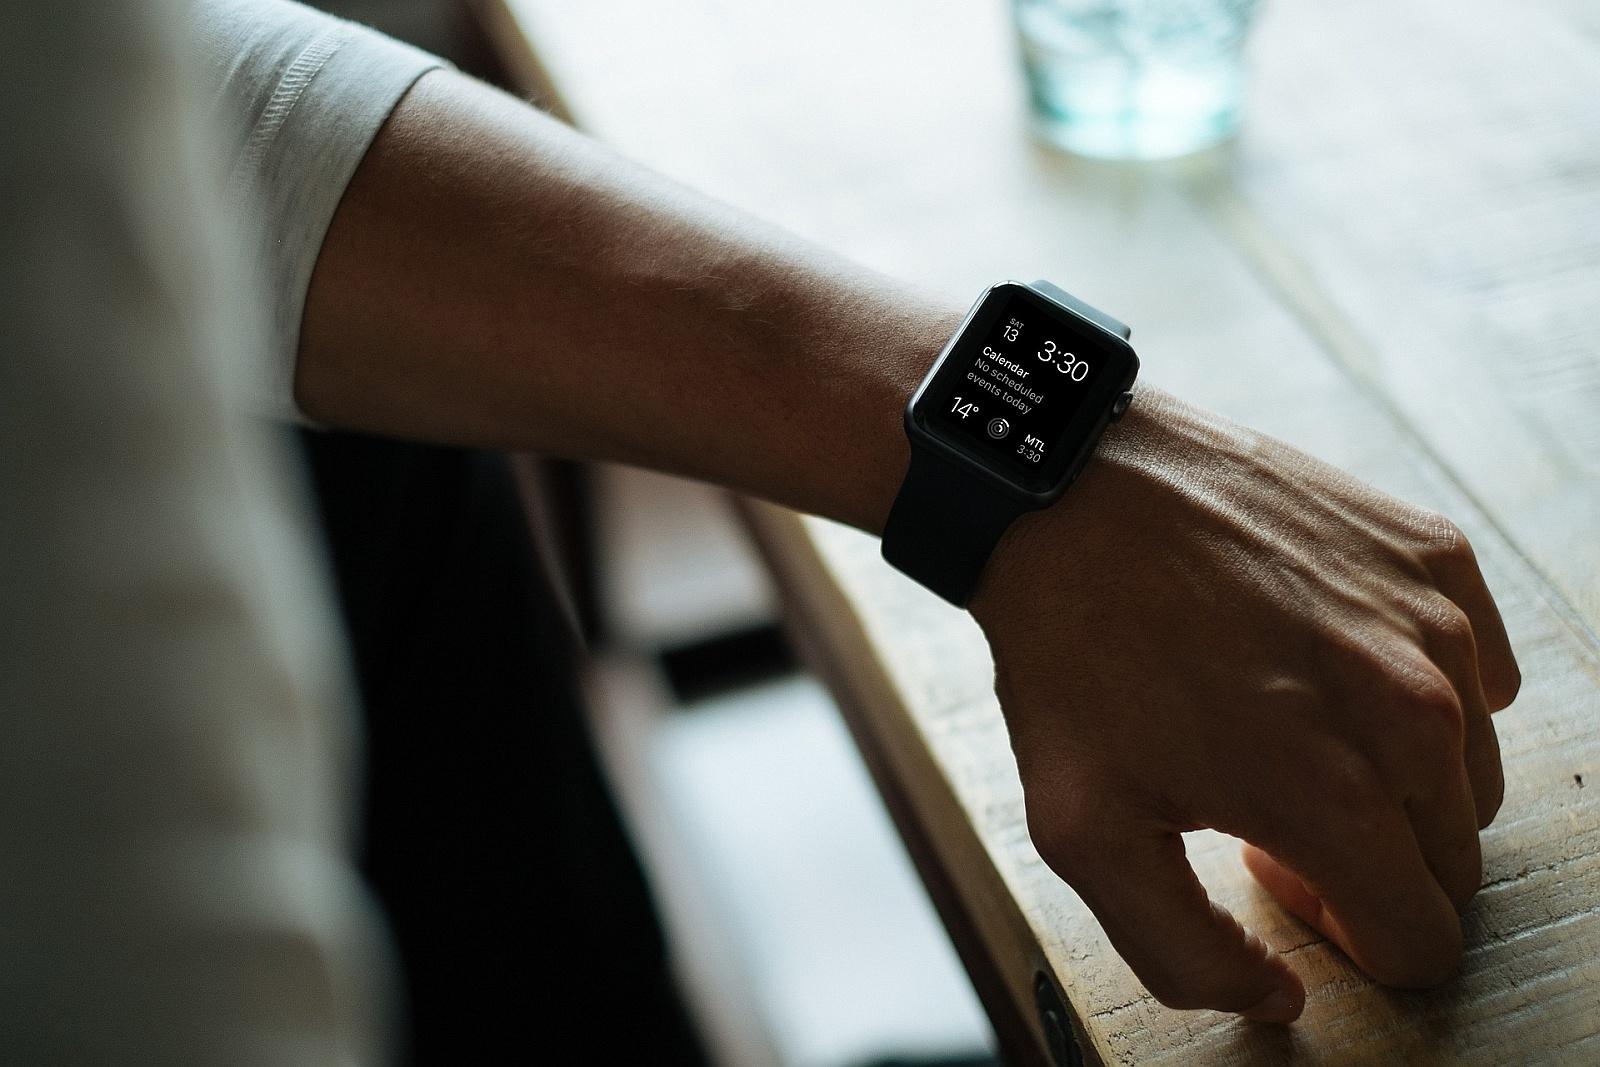 Apple Watch - Apple Pay